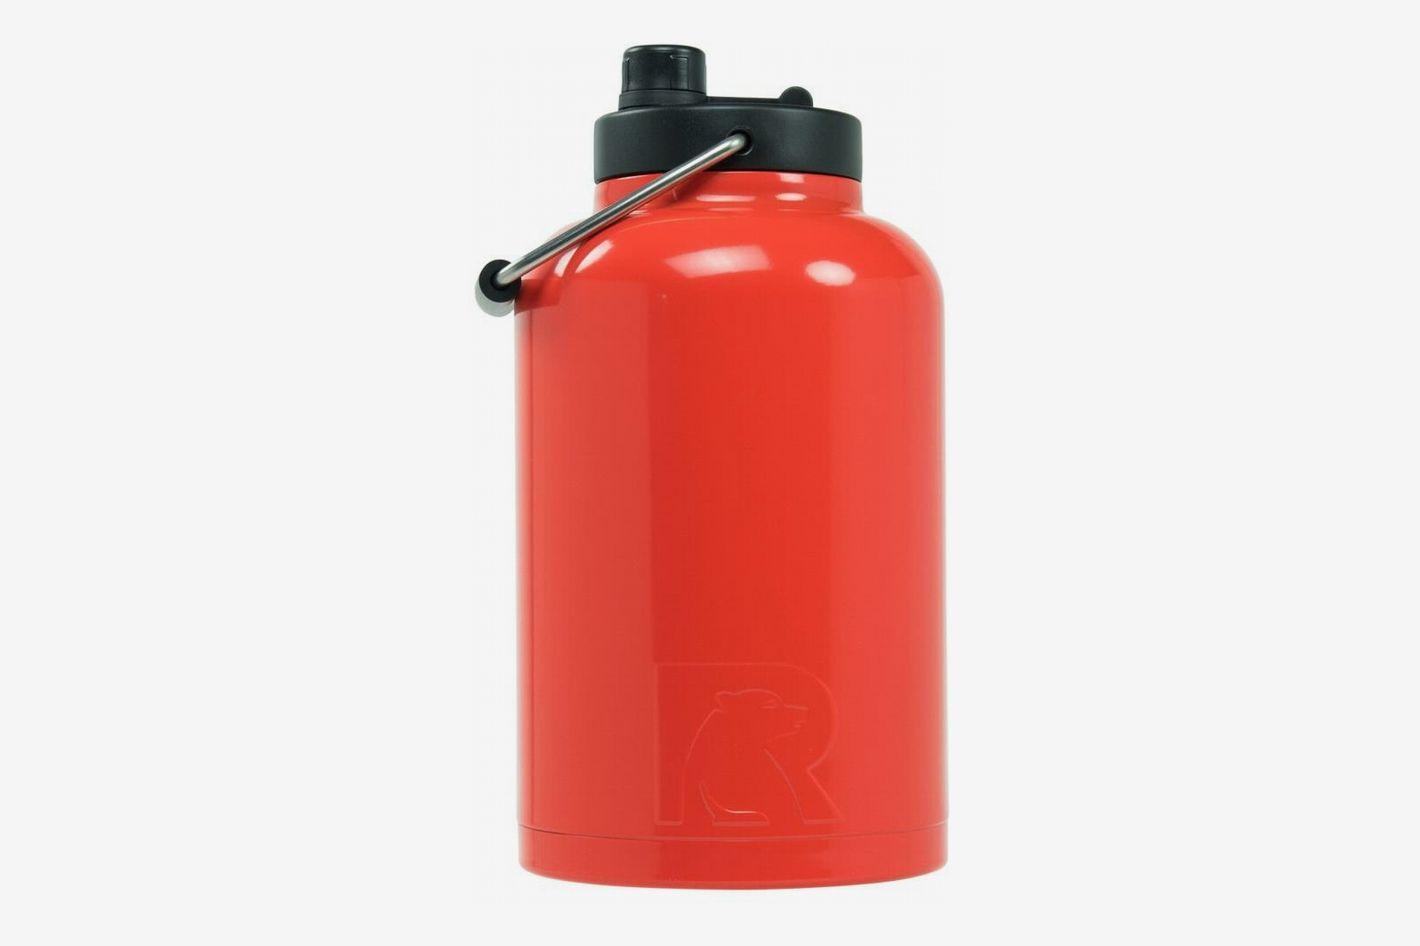 1552d1e37d 26 Best Water Bottles 2019: Stainless Steel, Reusable & More